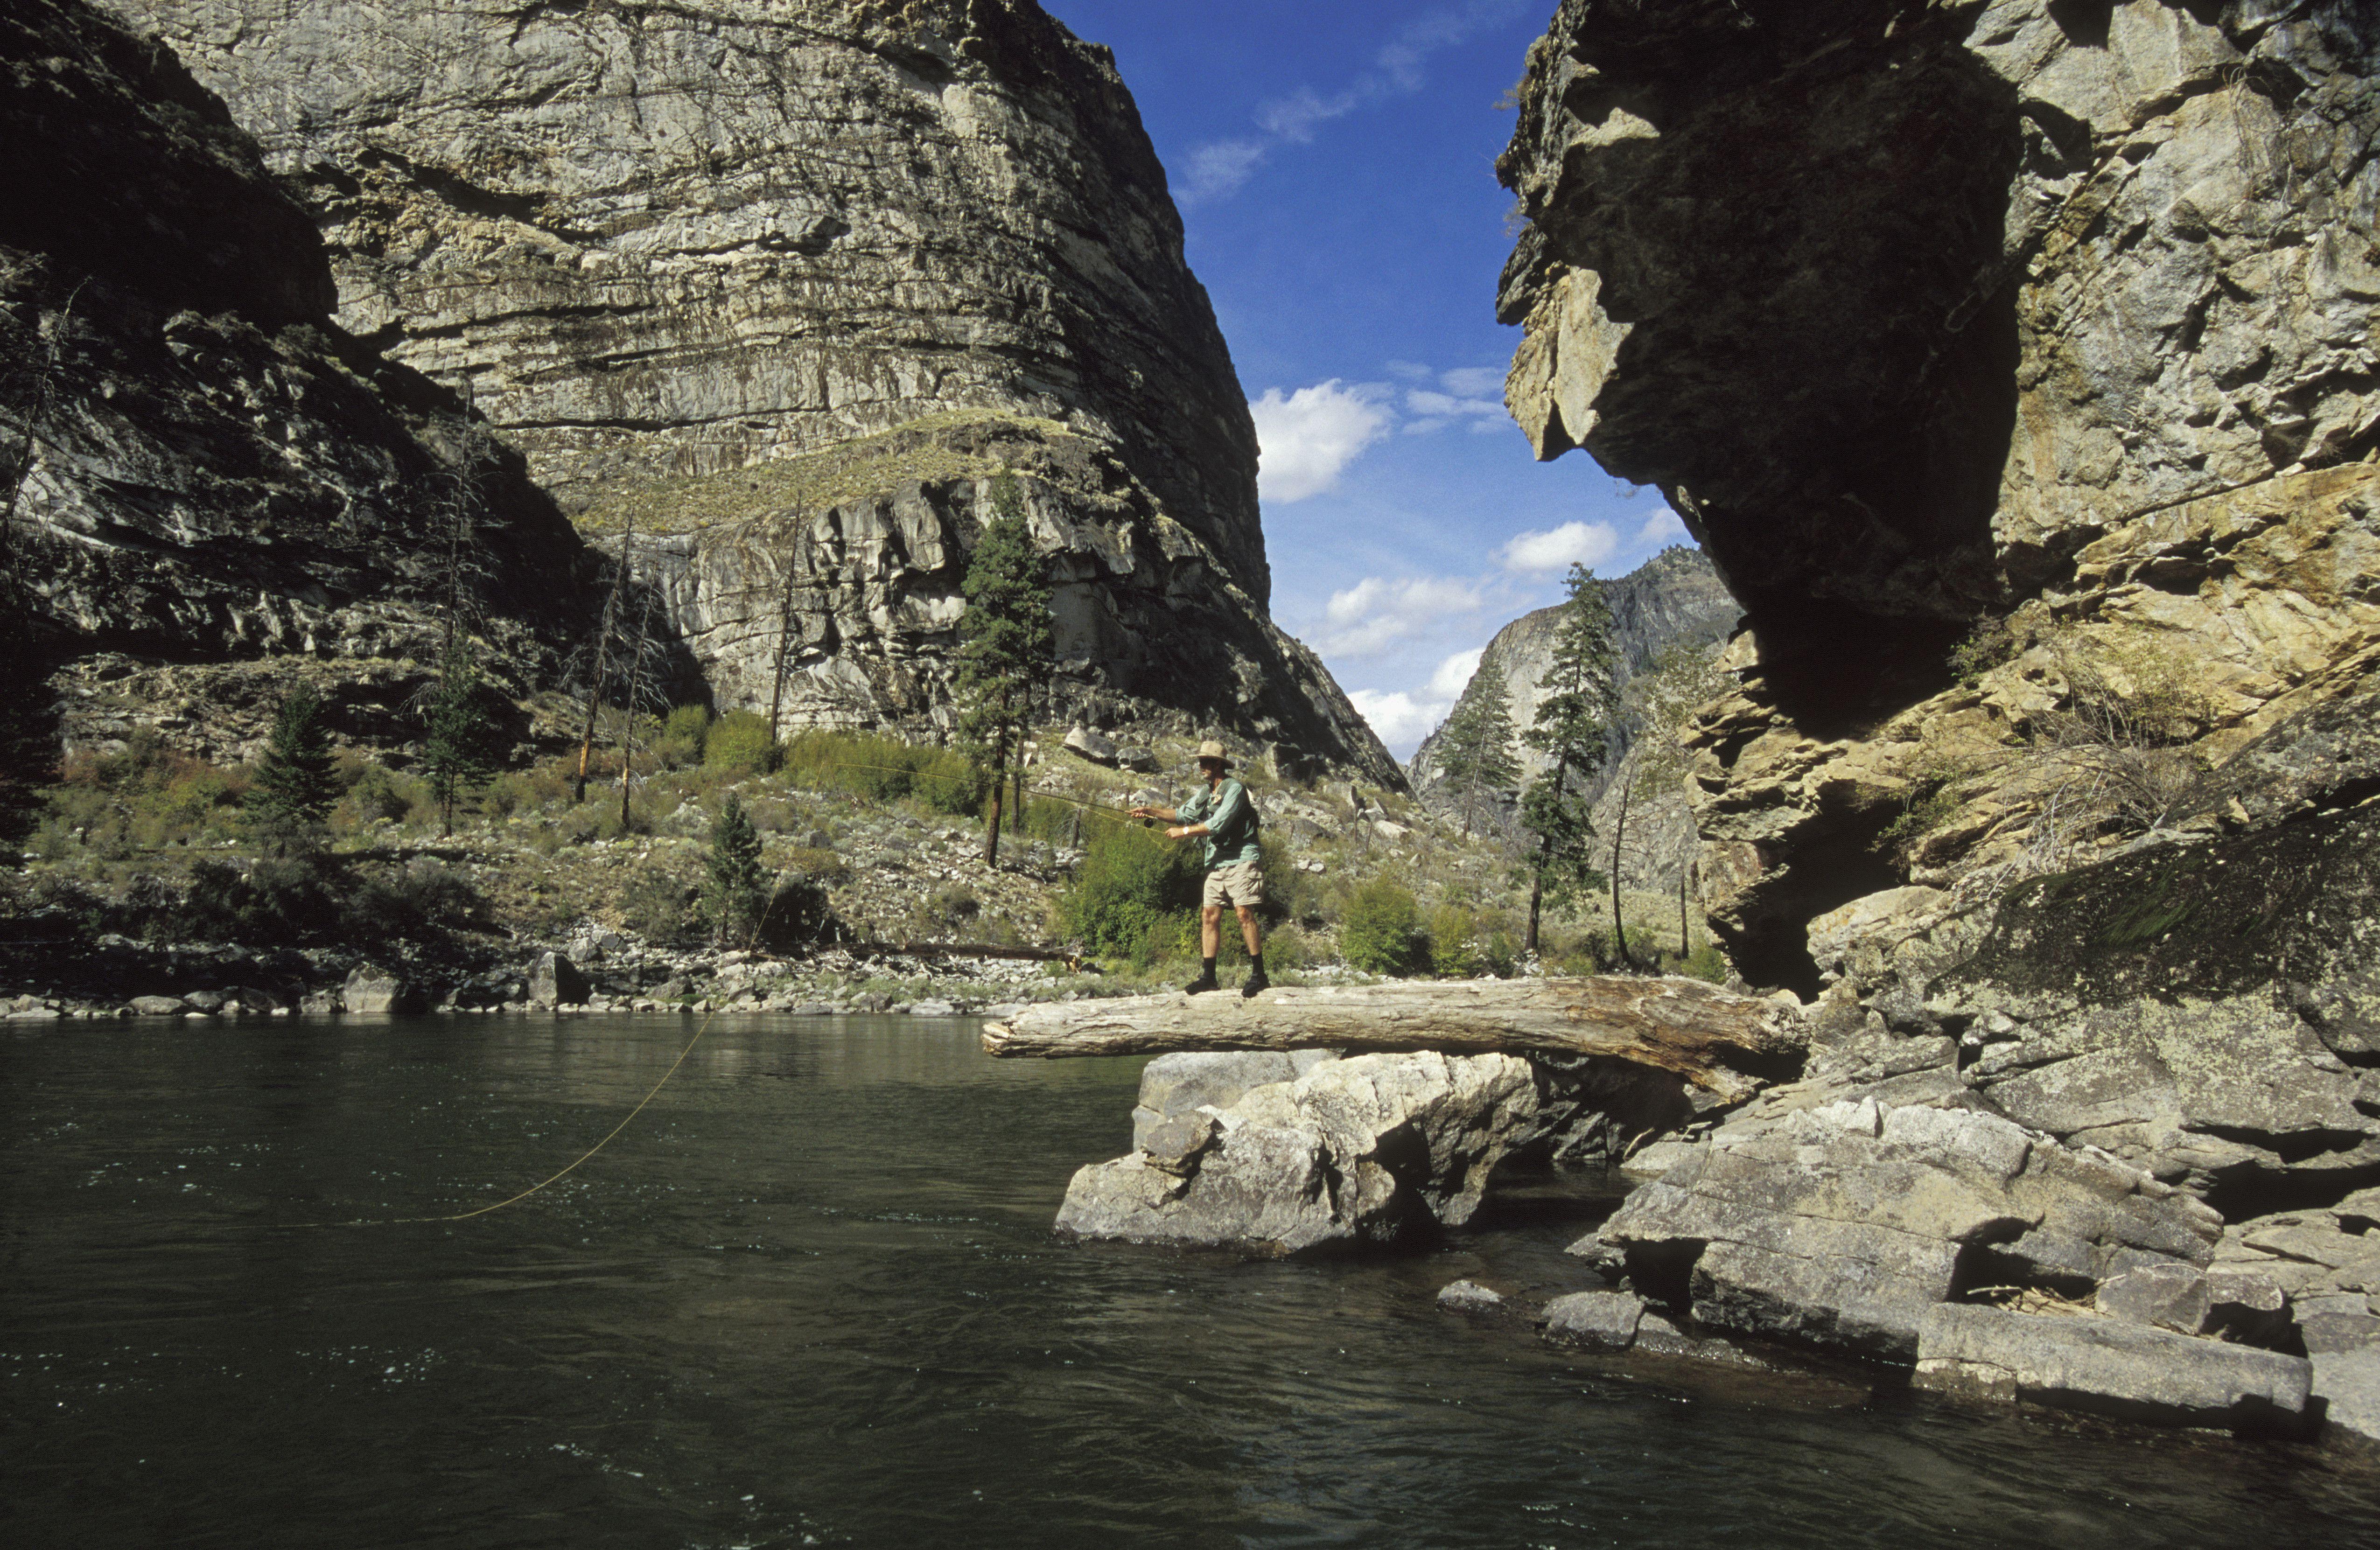 USA, Idaho, Middle Fork of Salmon River, man fly-fishing on log